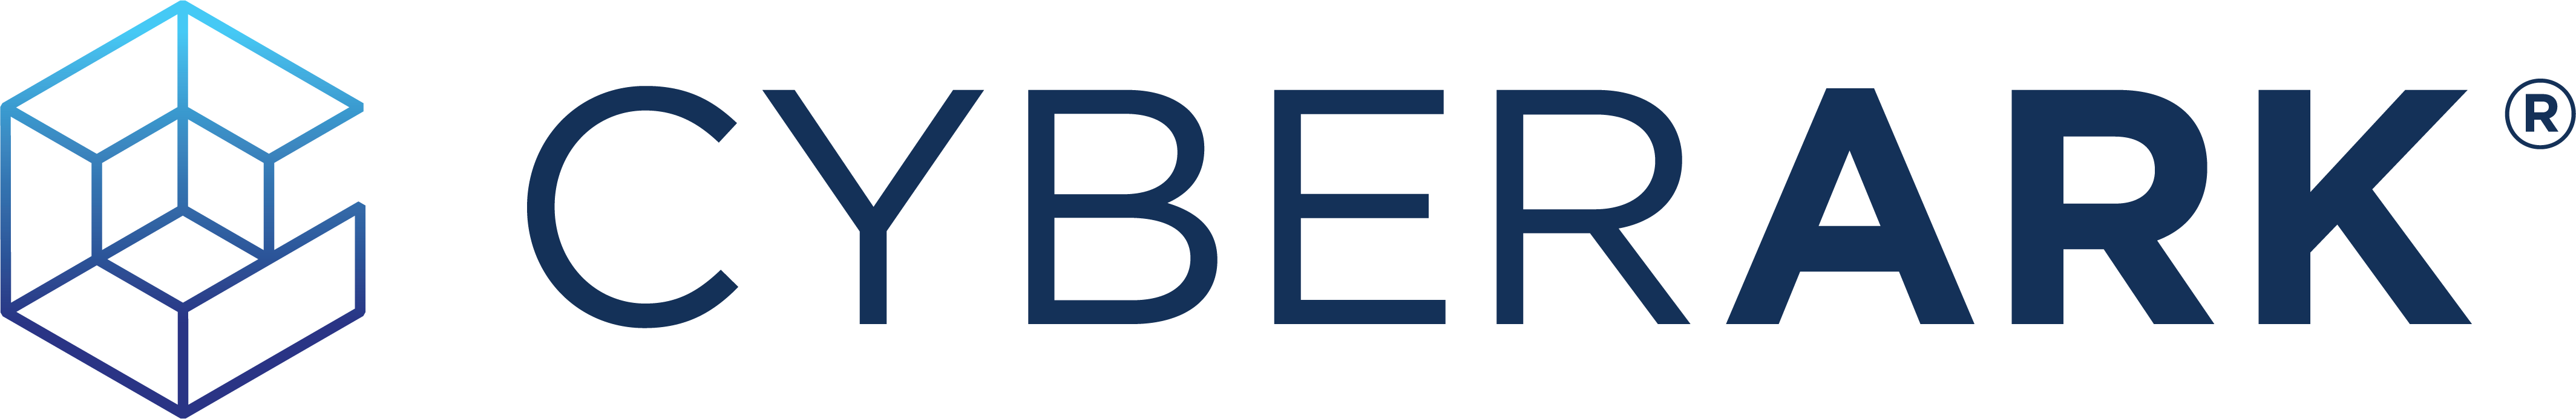 CyberArk Software (Singapore) Pte Ltd